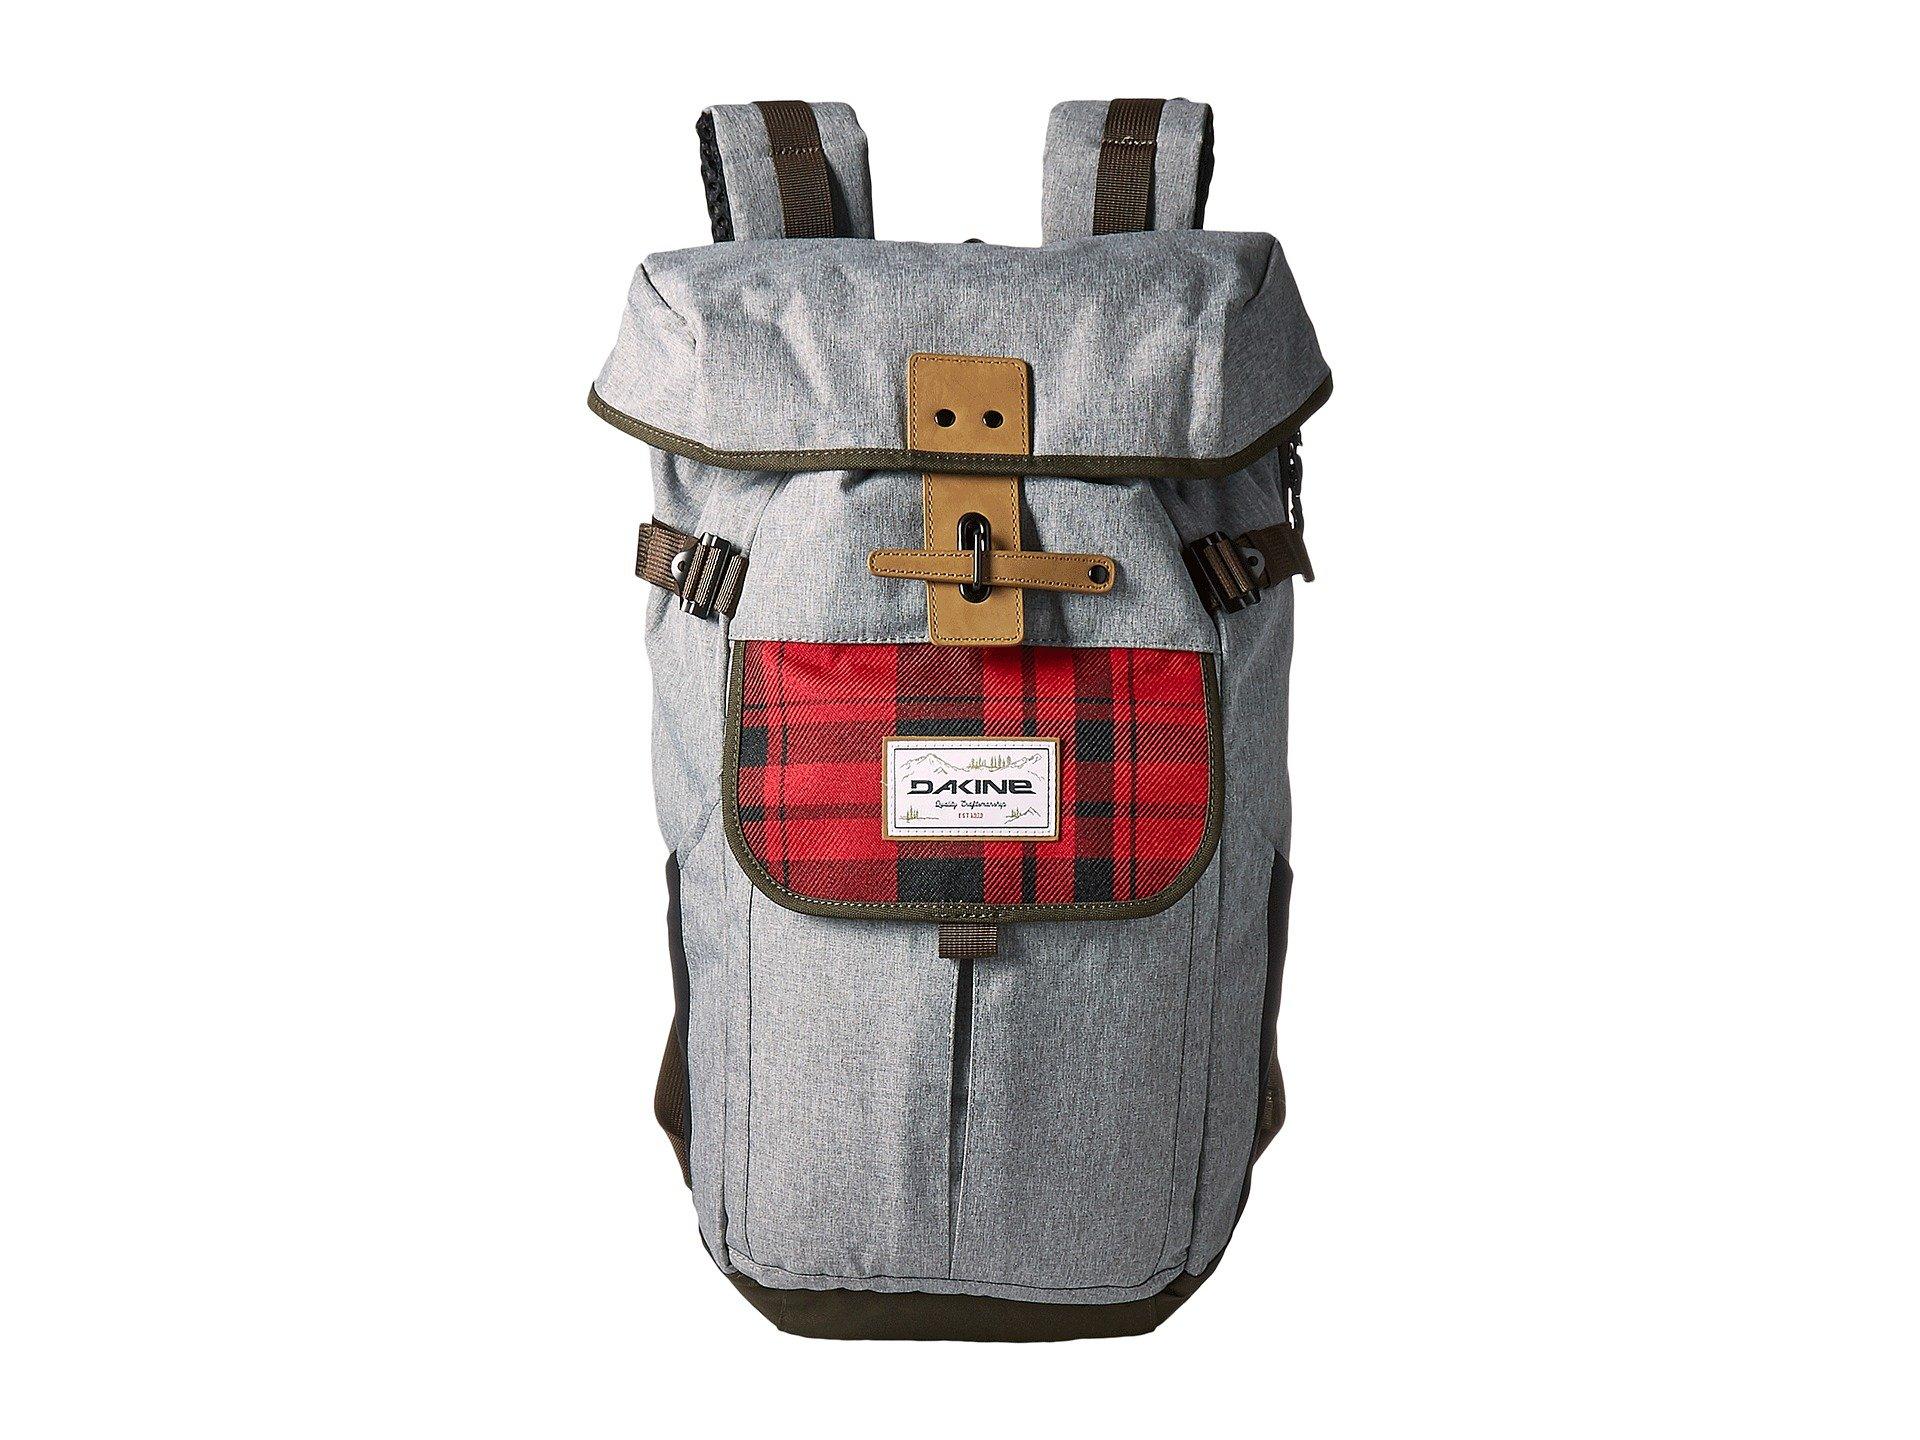 Morral para Hombre Dakine Caravan Backpack 27L  + Dakine en VeoyCompro.net